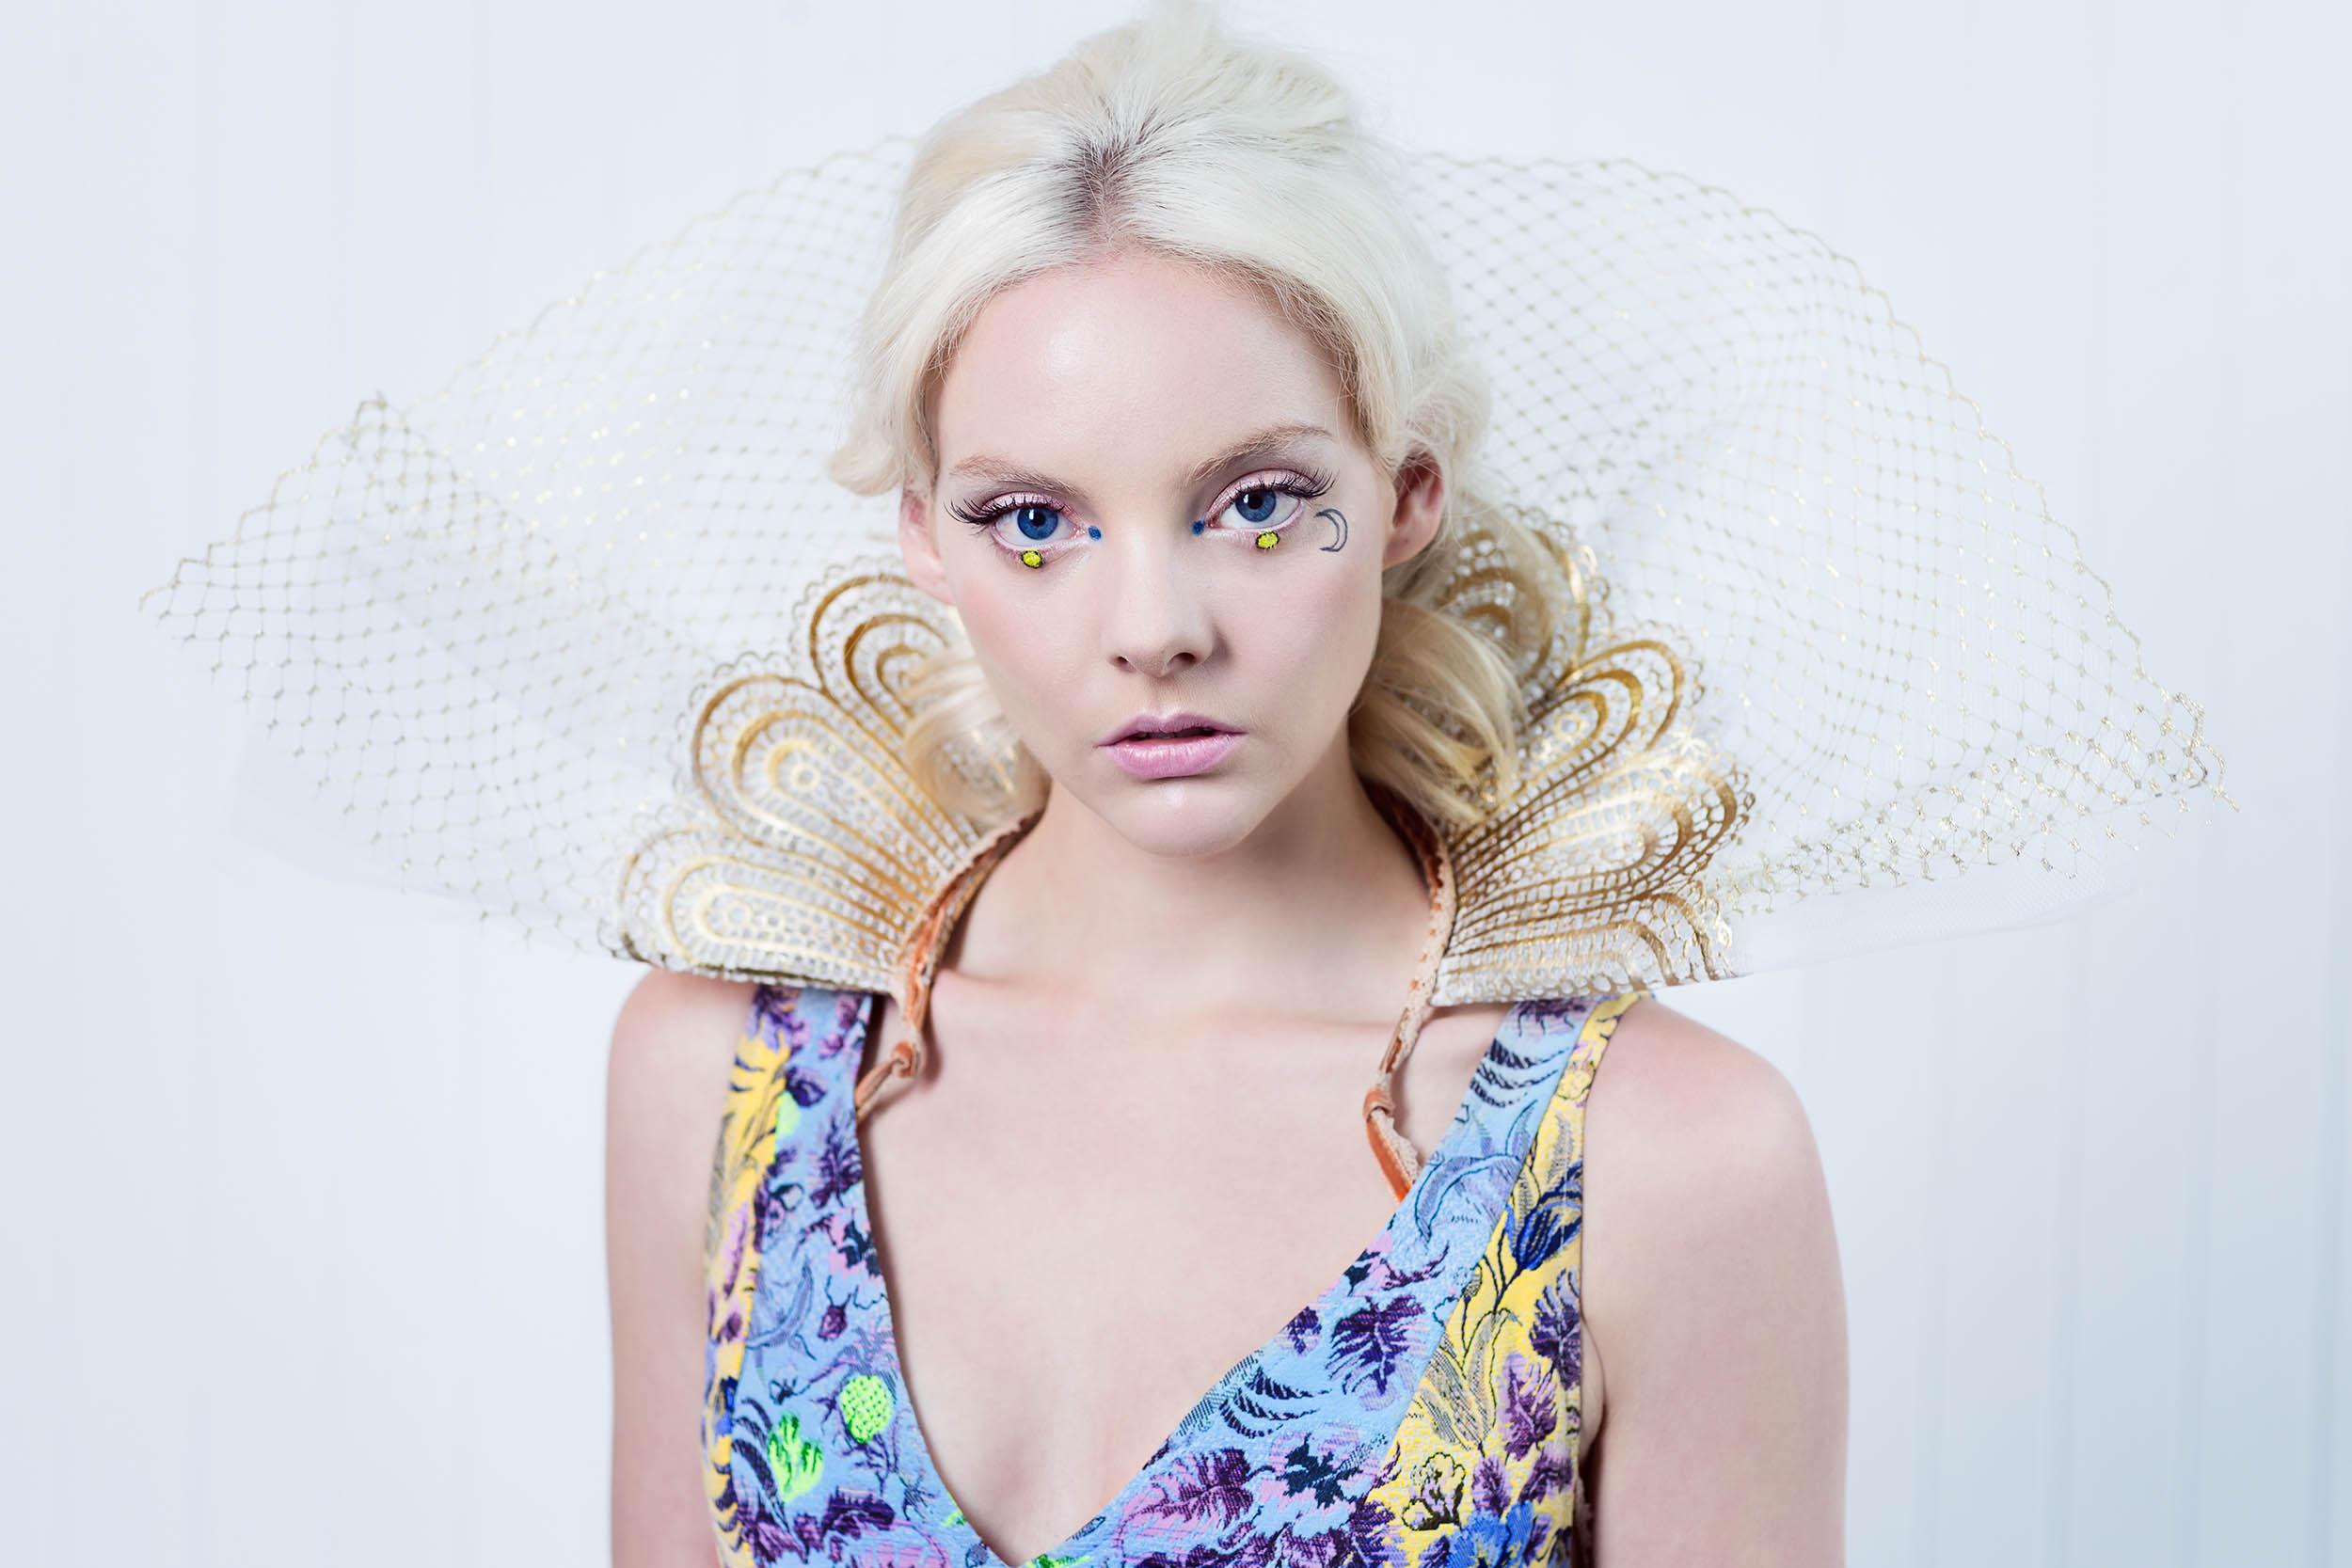 LADY PETROVA | Images by Raphael Ruz